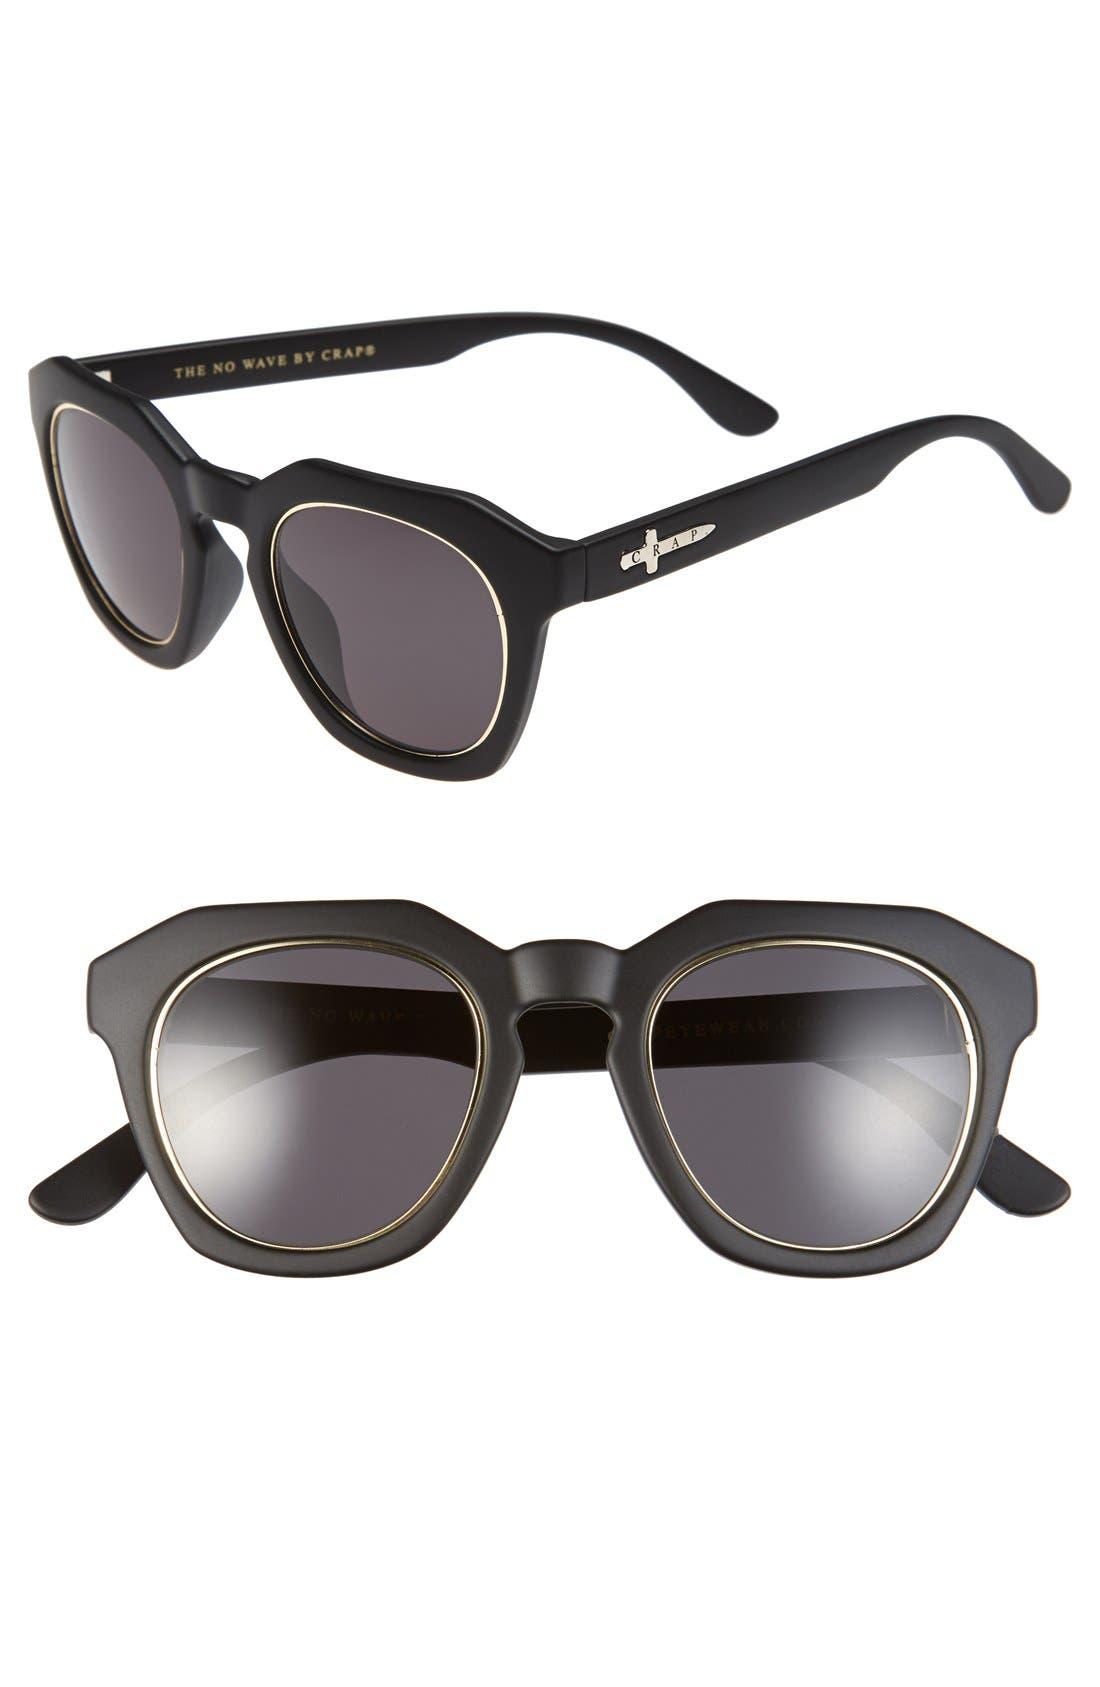 CRAP Eyewear 'No Wave' 47mm Sunglasses